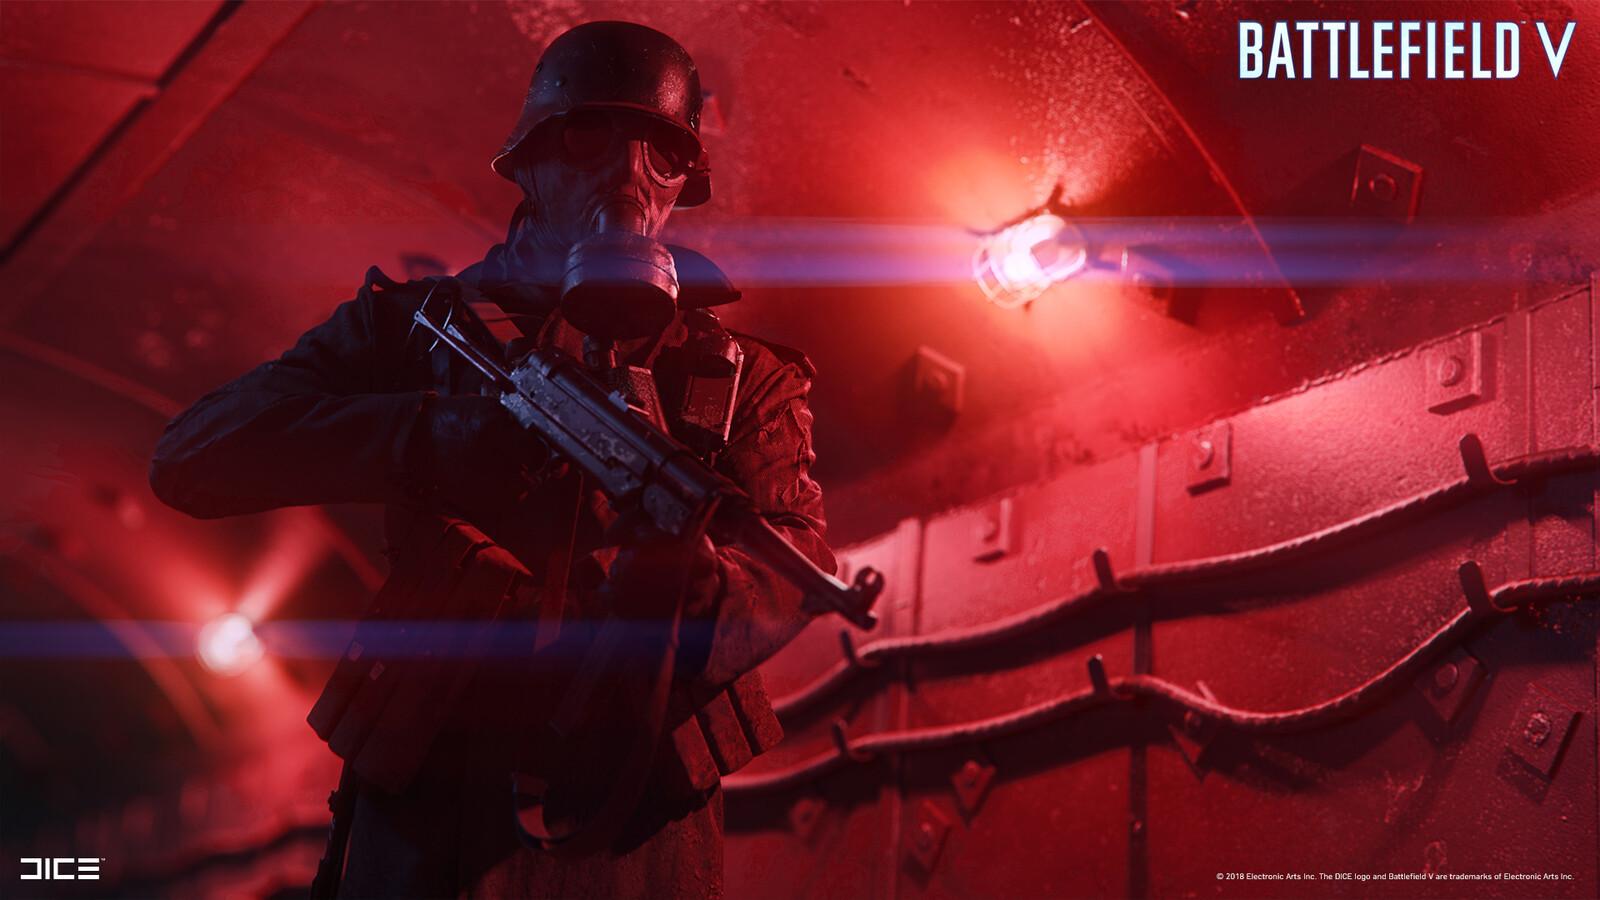 """Battlefield V"" - Axis Bunker Raid - Visual target concept"